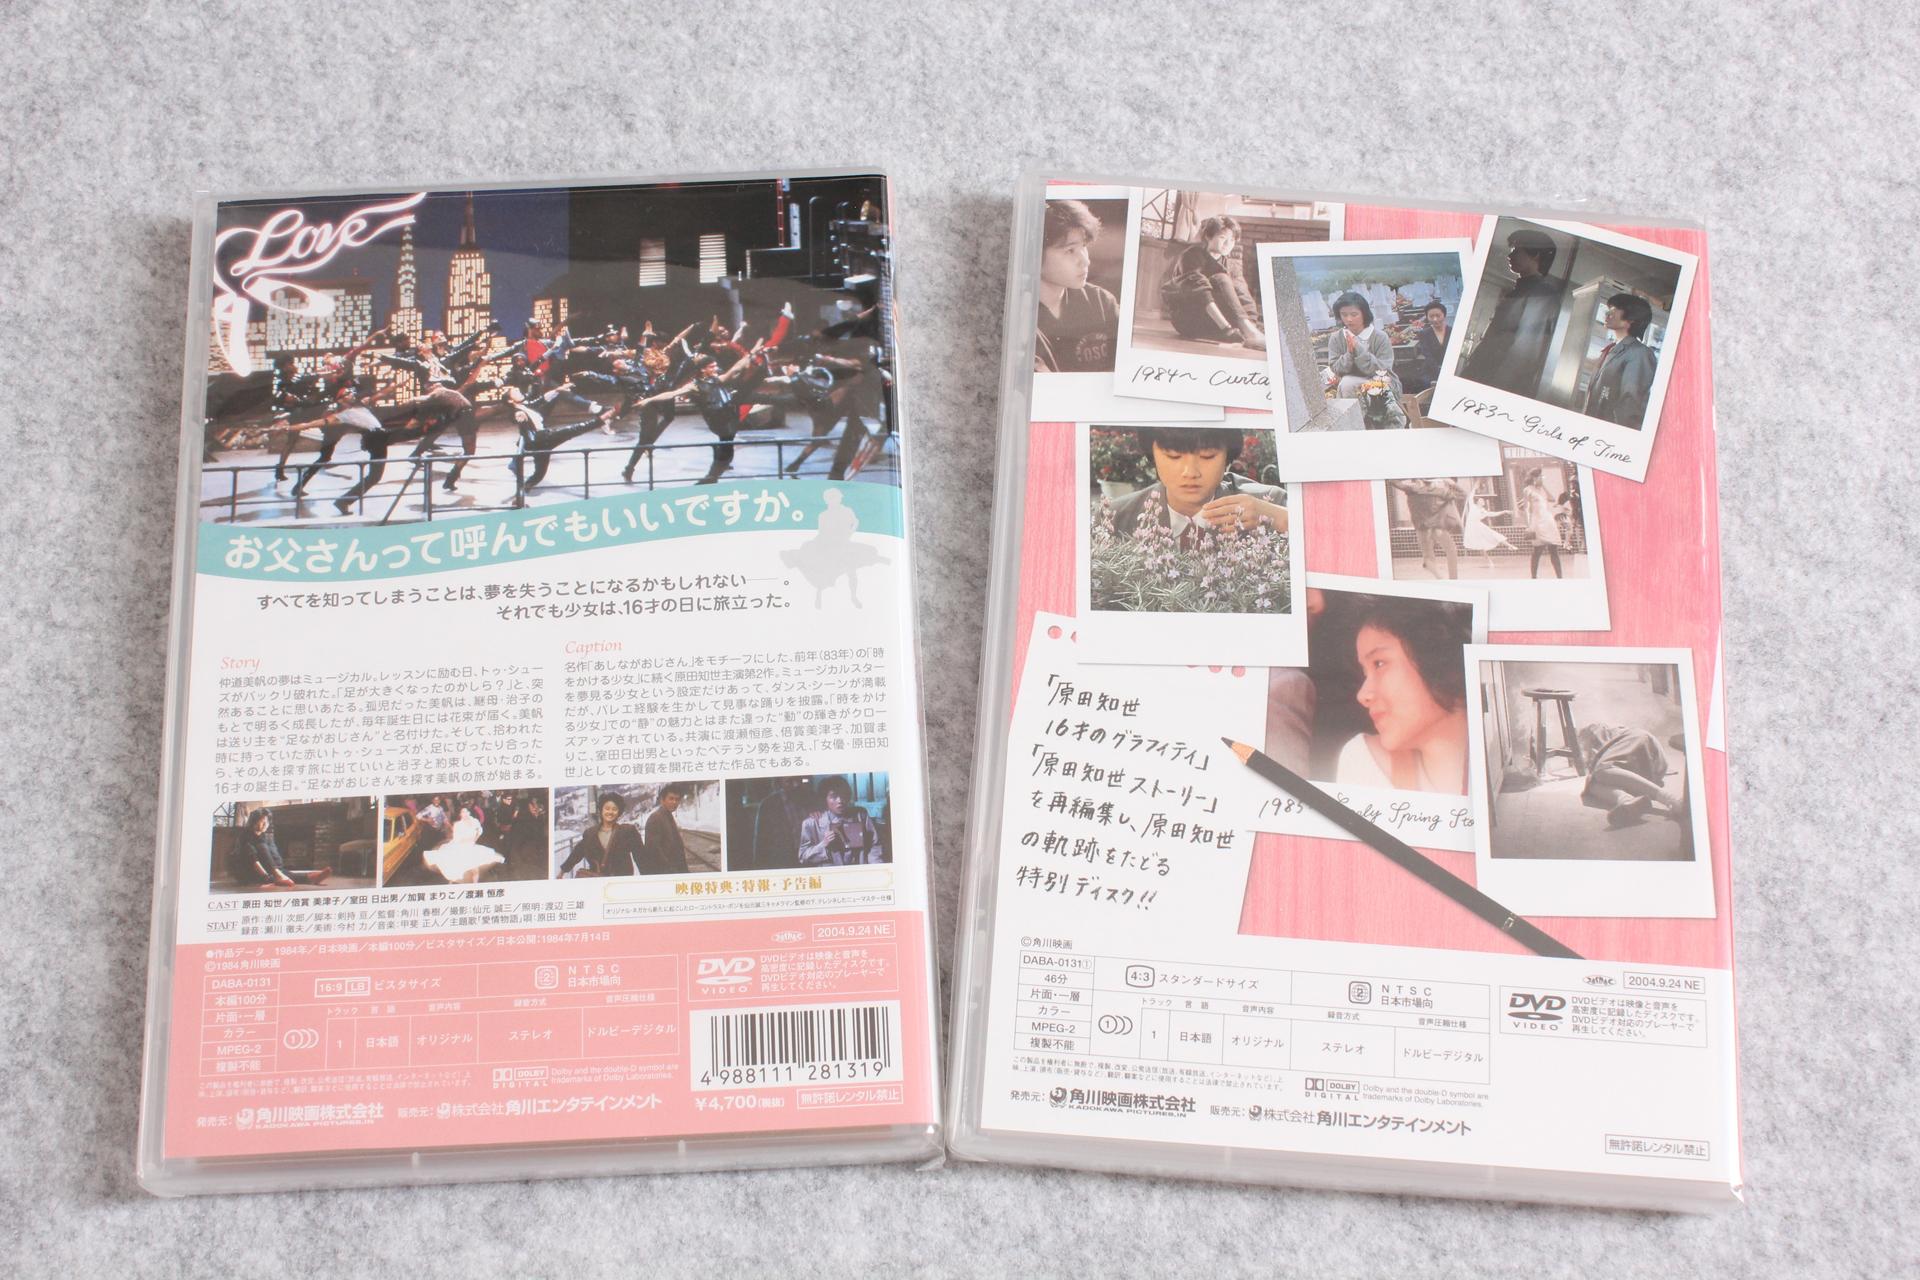 2019-02-15-TOMOYO_BD-DVD-5.JPG